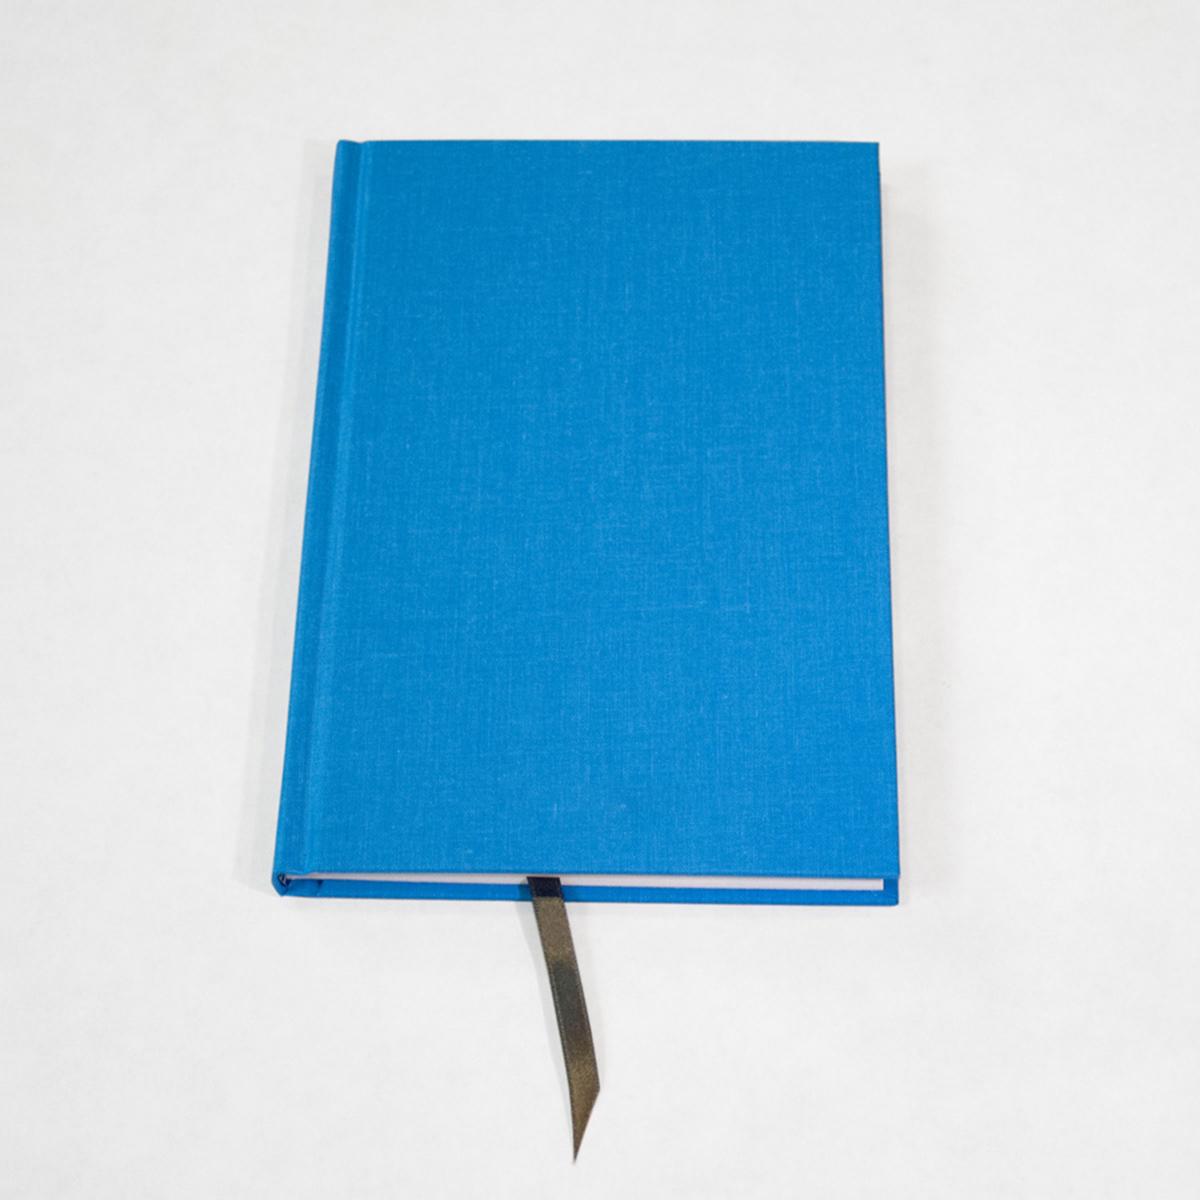 Shepley Bulfinch Blue Journal